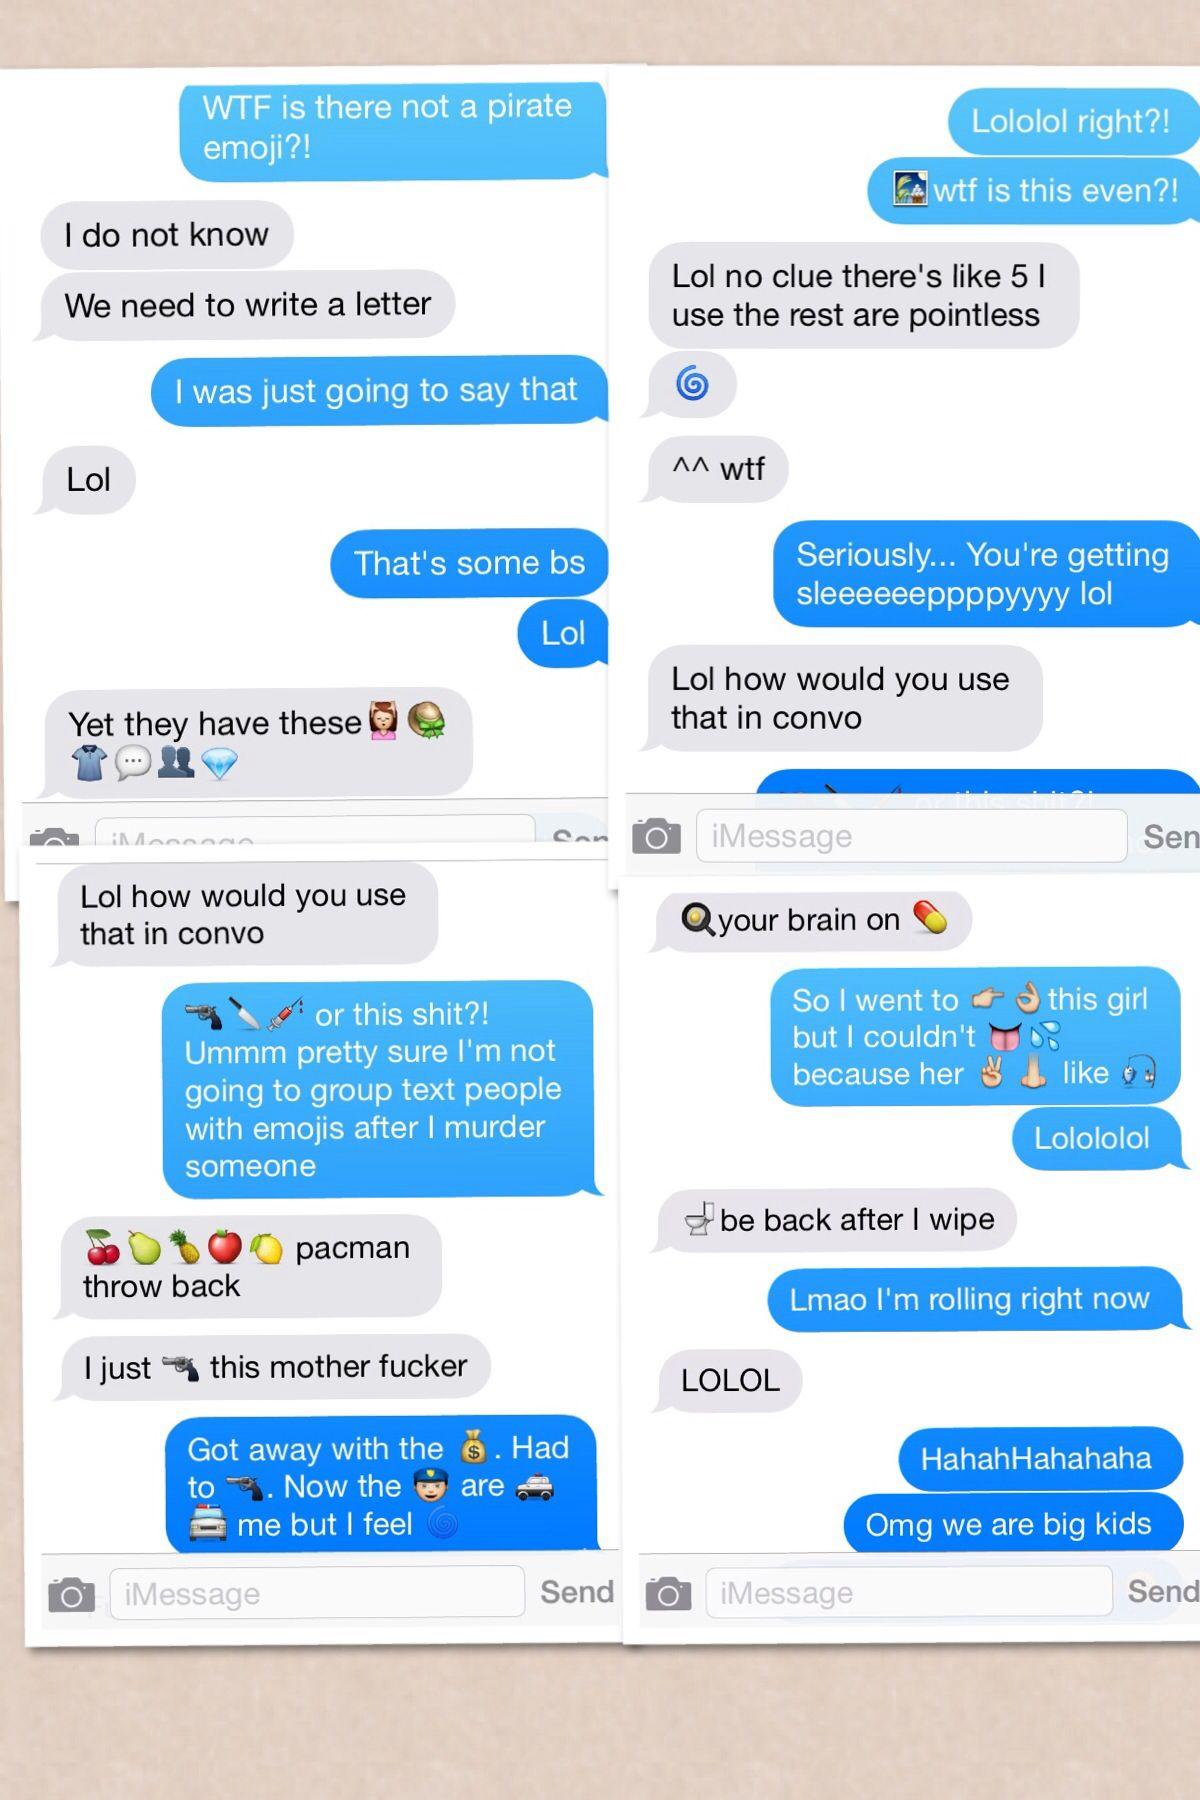 Pardon the language ... #texting #imessage #textingfails #funny